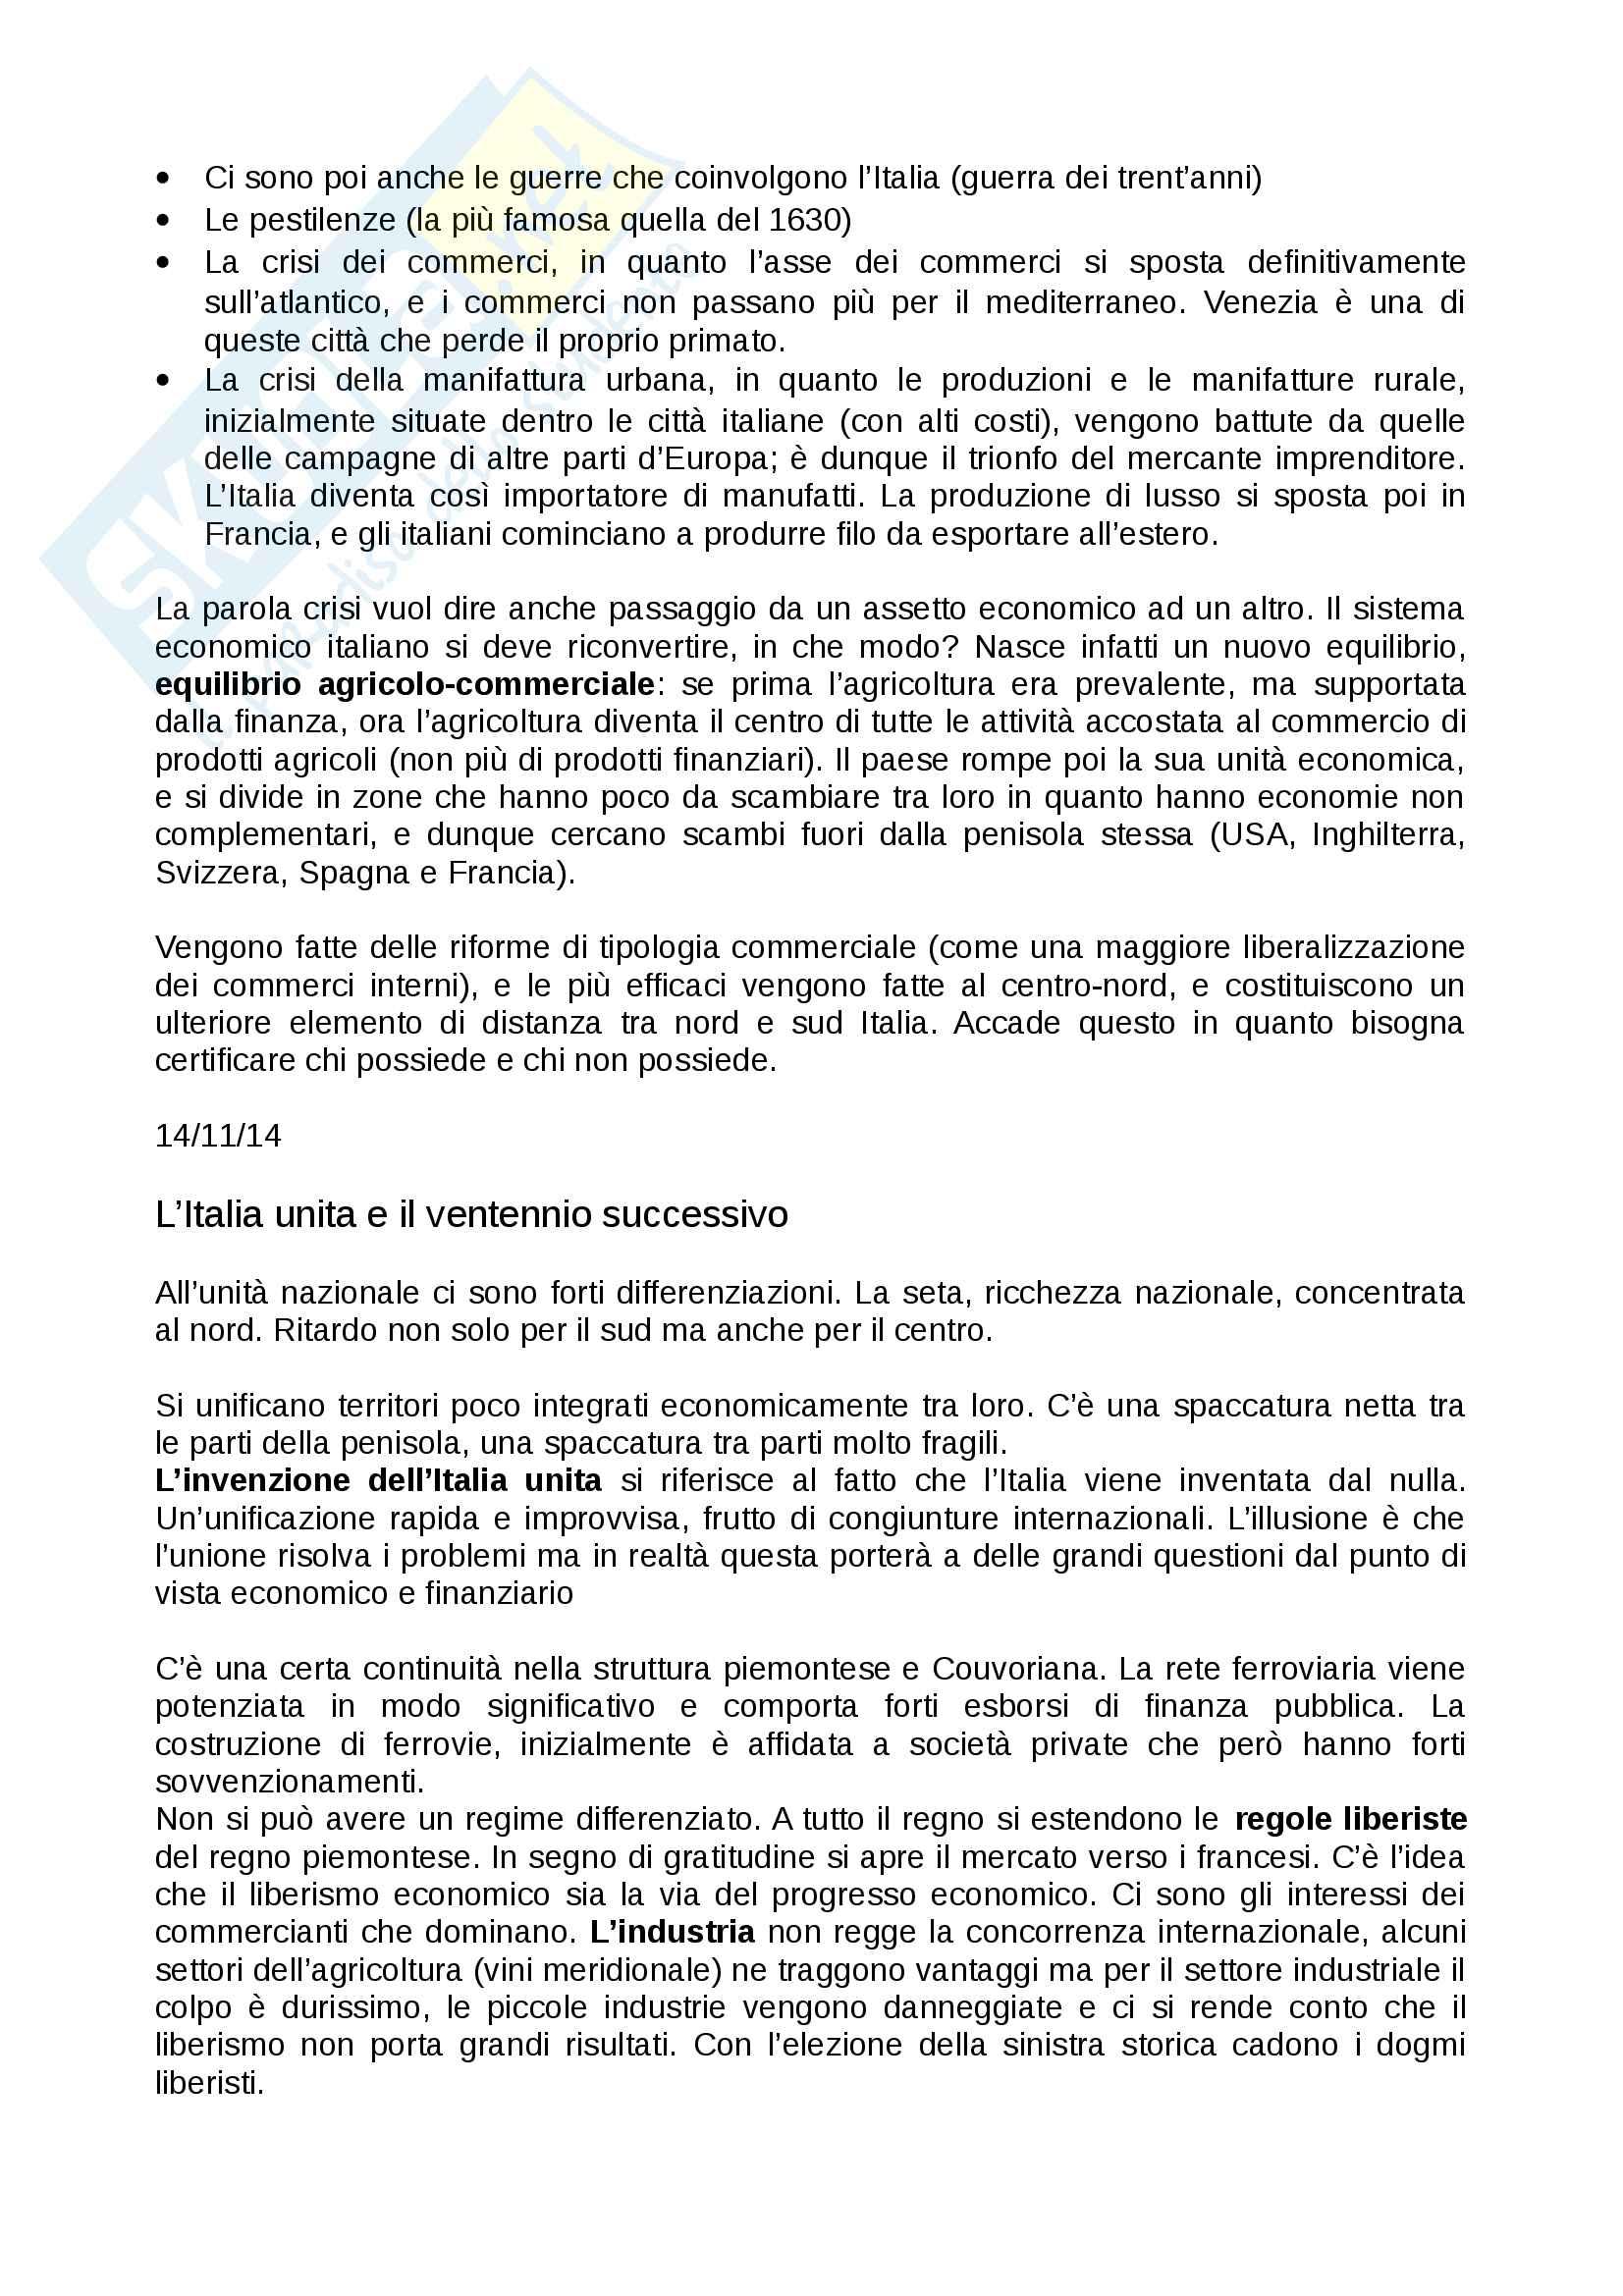 Appunti Storia economica Besana UNICATT Pag. 2